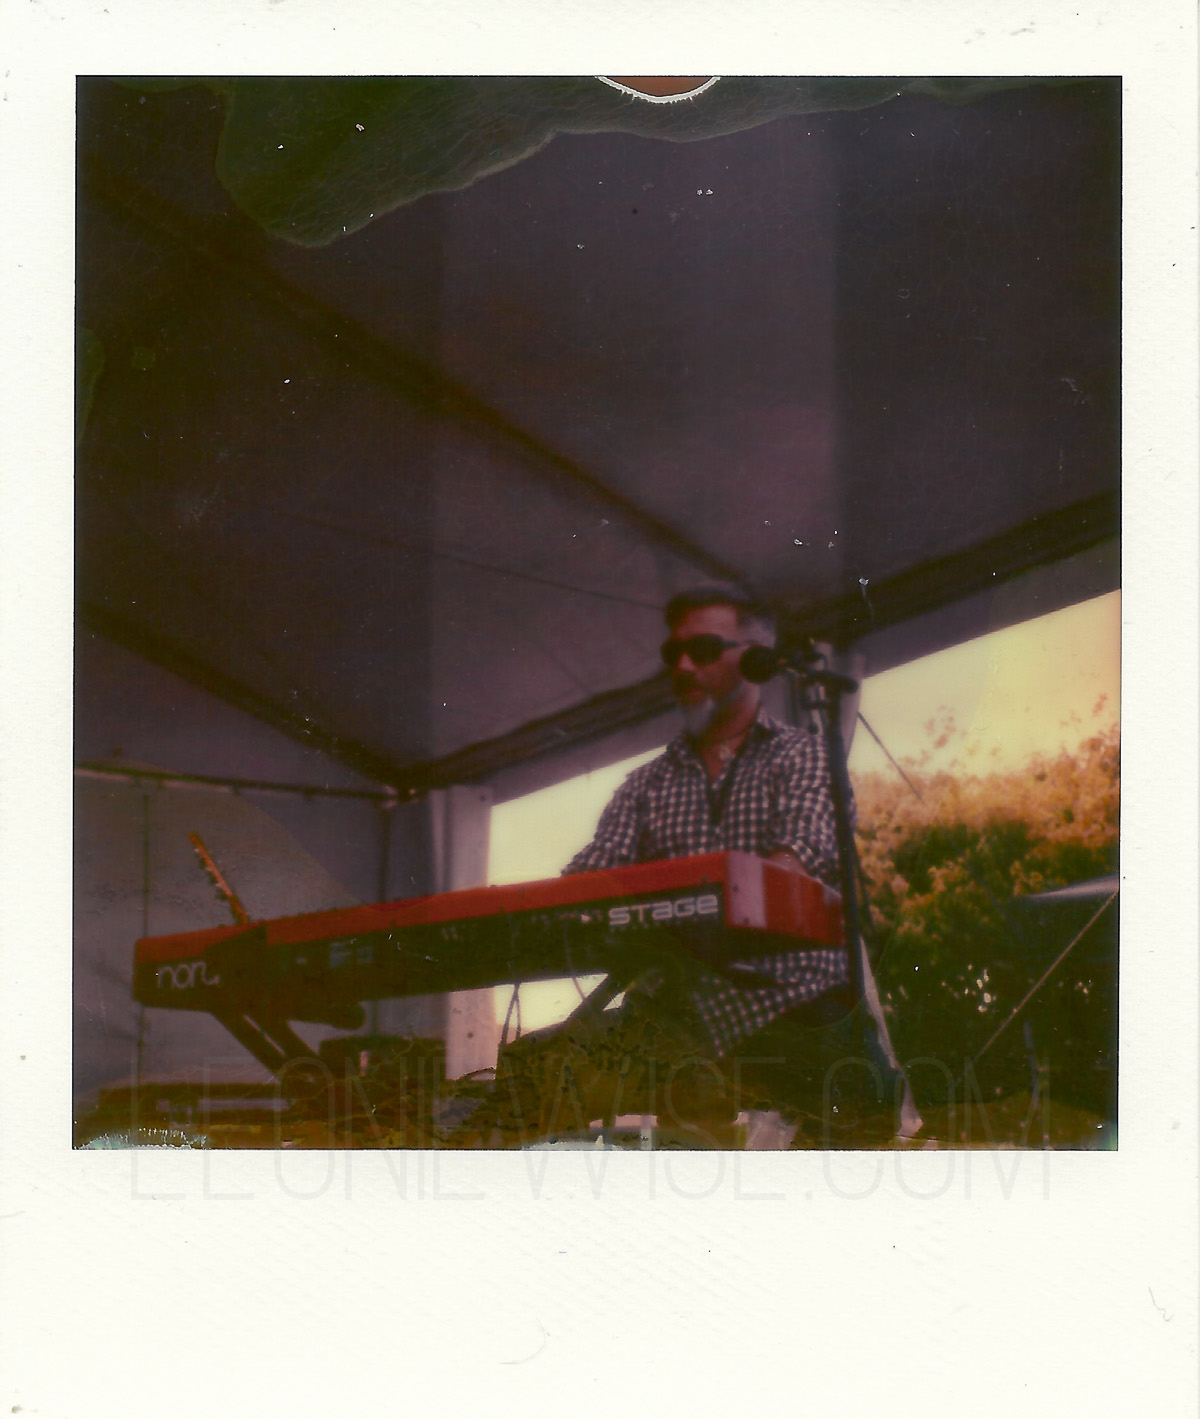 MusicAtMatua_Polaroid-SX70_Impossible-PX70_leoniewise-2